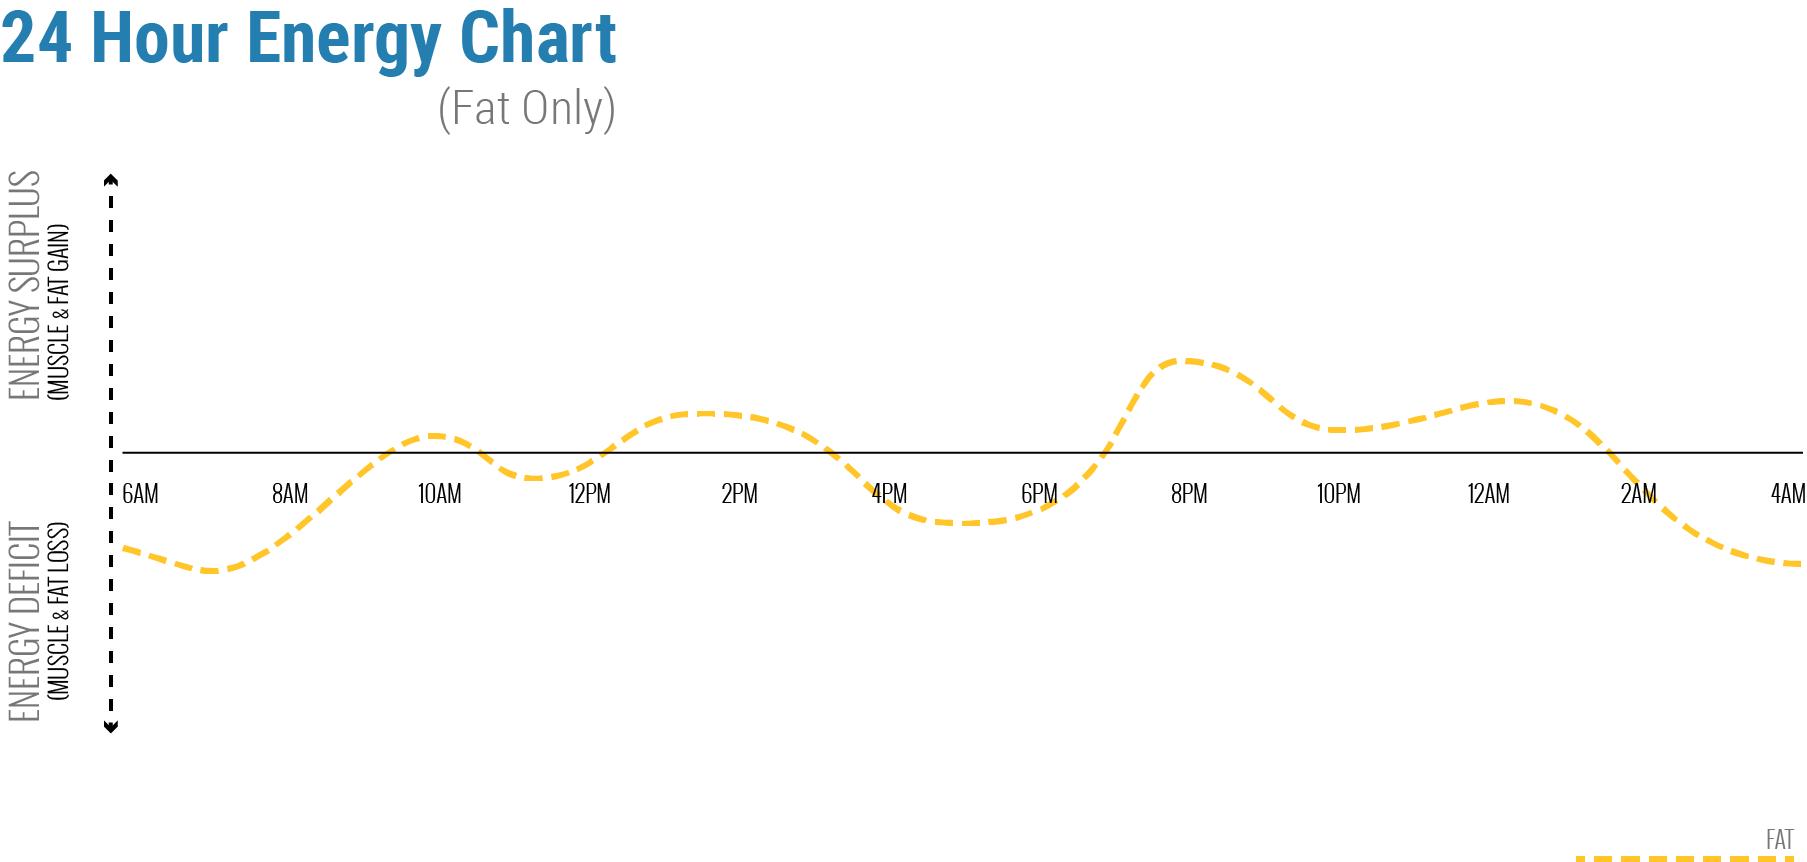 24 Hour Fat Intake Chart